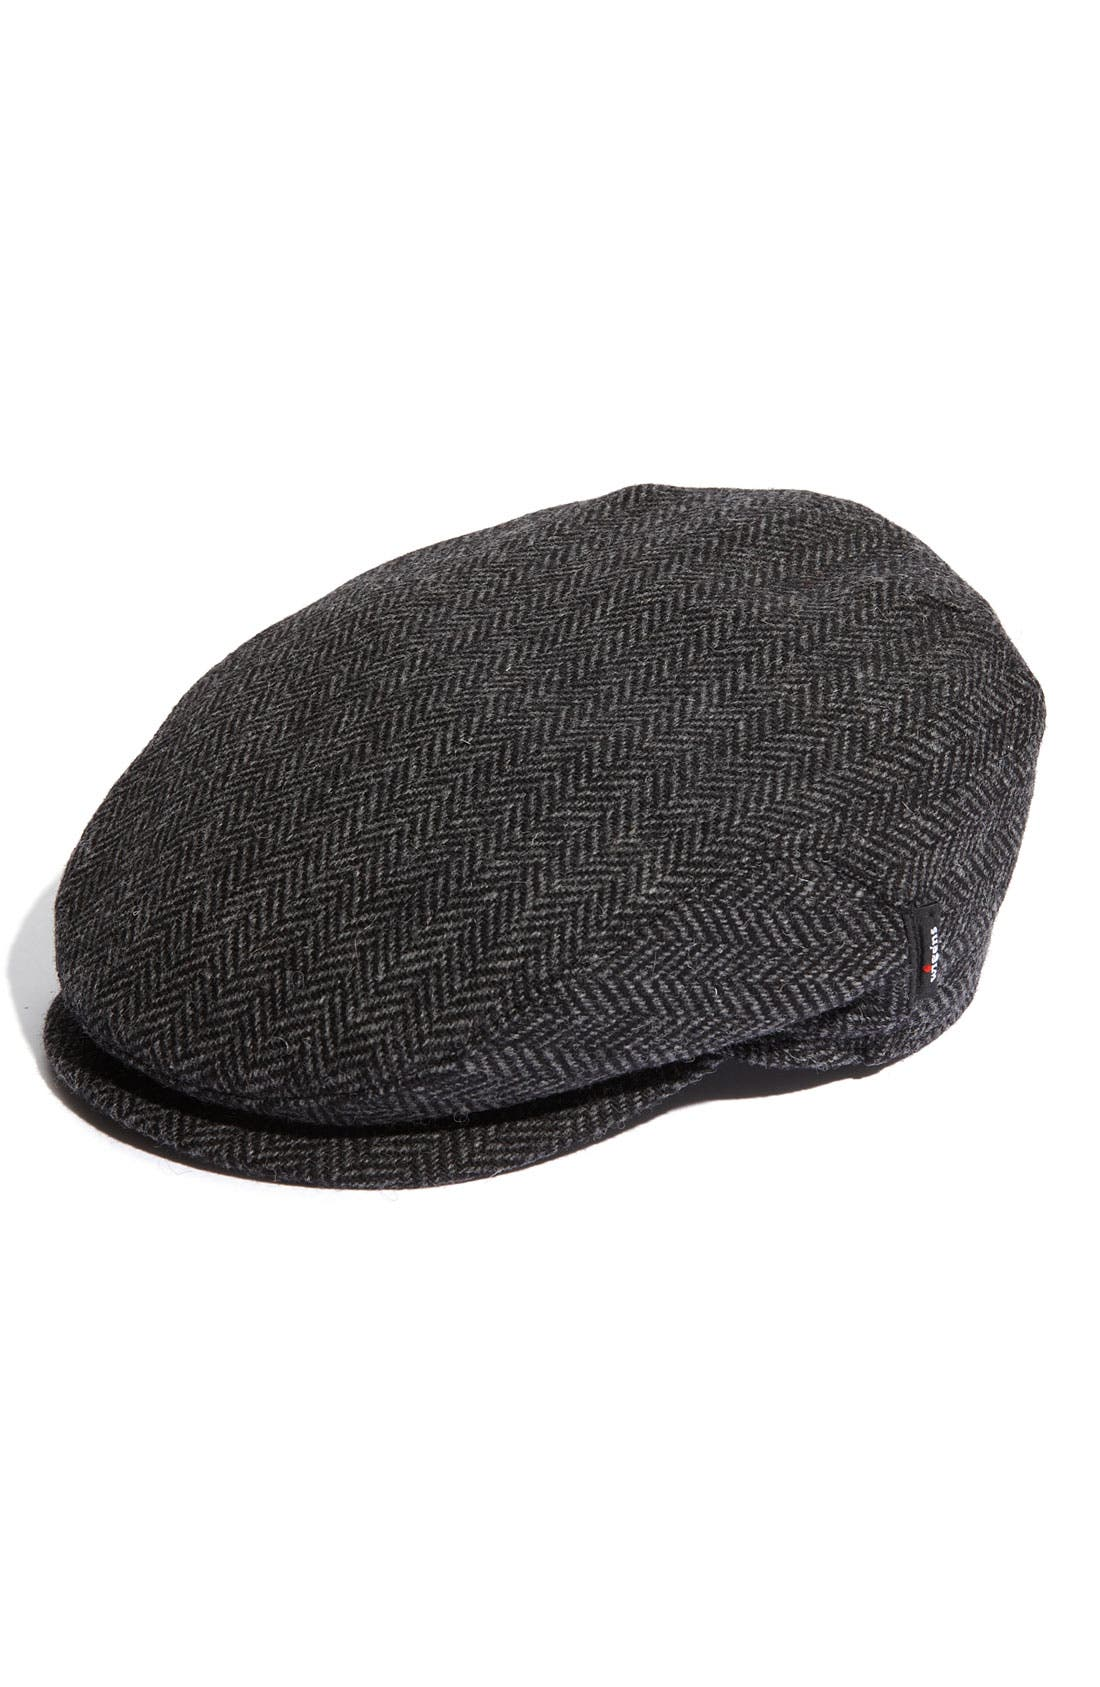 Alternate Image 1 Selected - Wigens Herringbone Cap